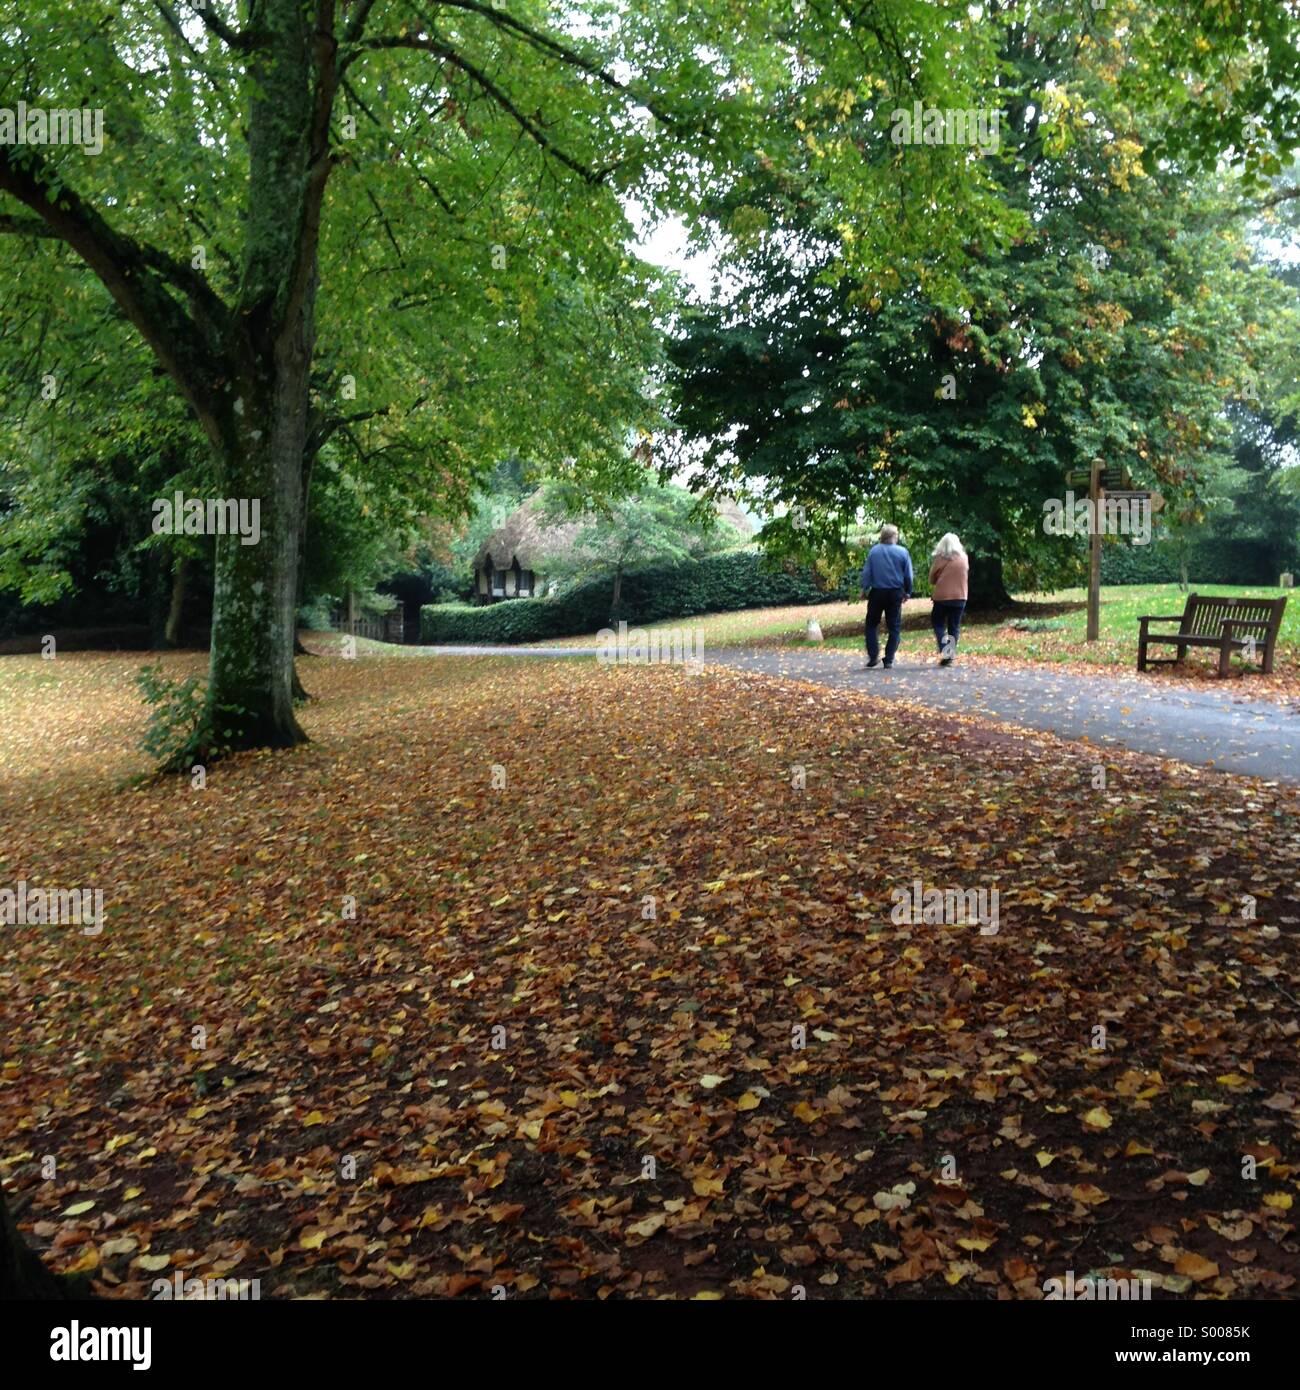 Autumn scene at Cockington village in Torquay, English Riviera (Torbay), United Kingdom. - Stock Image